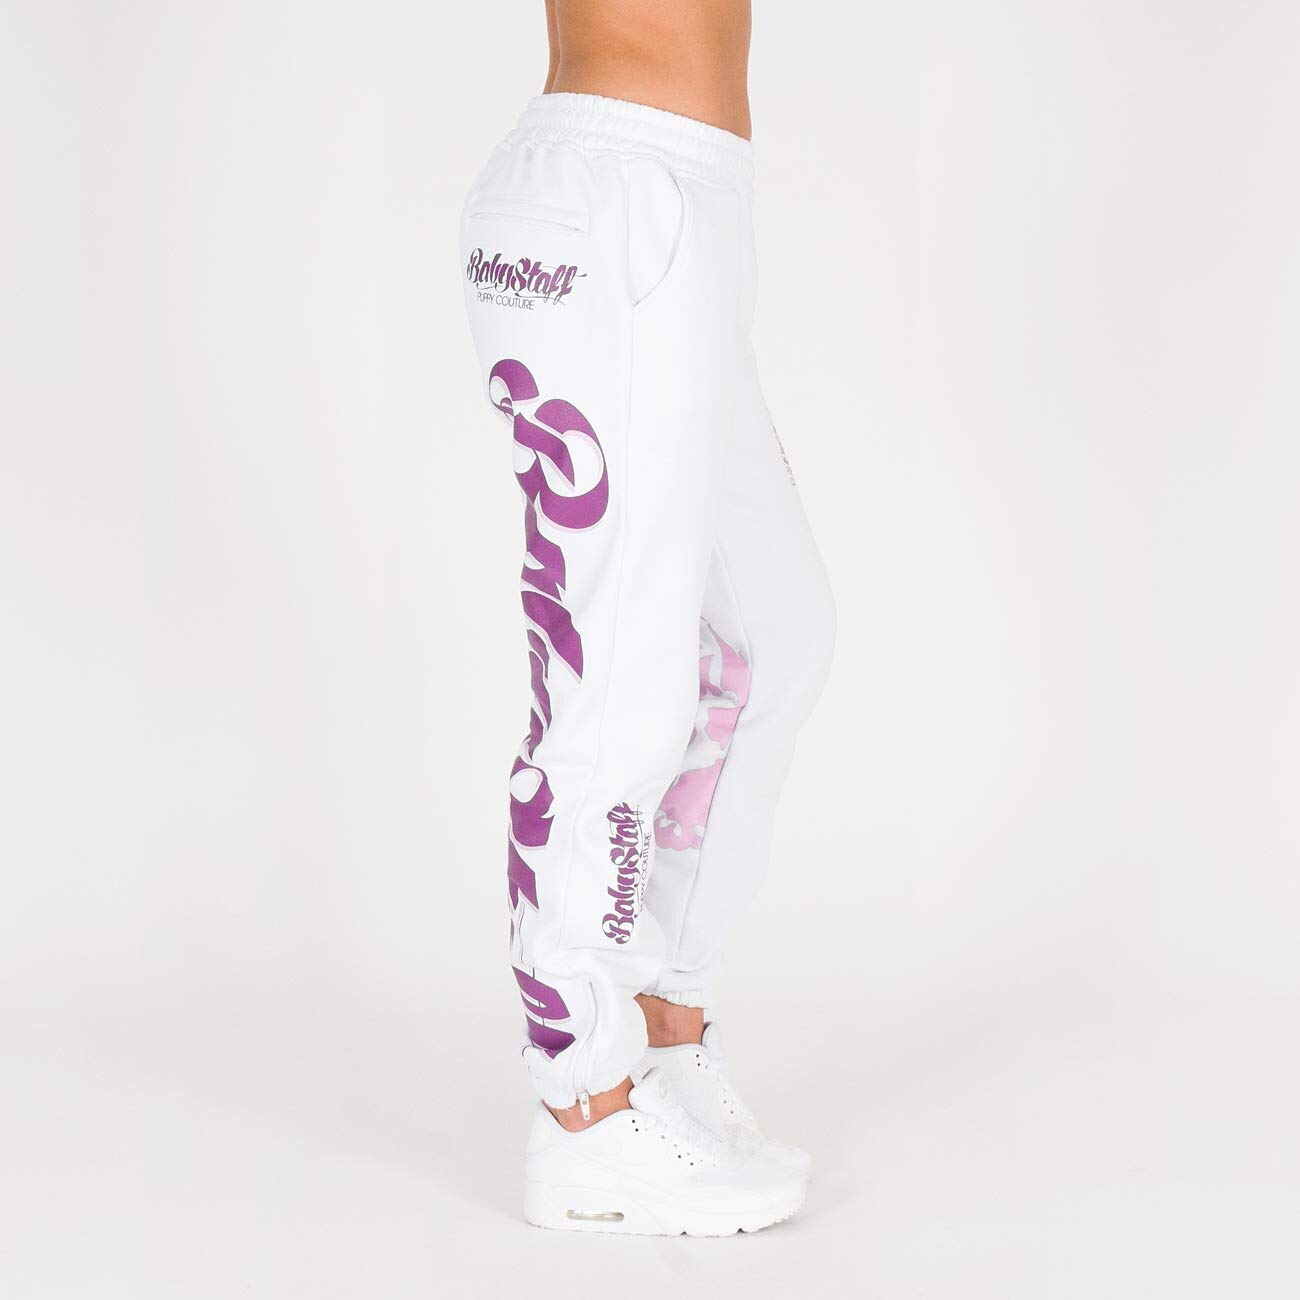 Bianco Colore Pantaloni da Jogging da Donna Babystaff Merah Sport